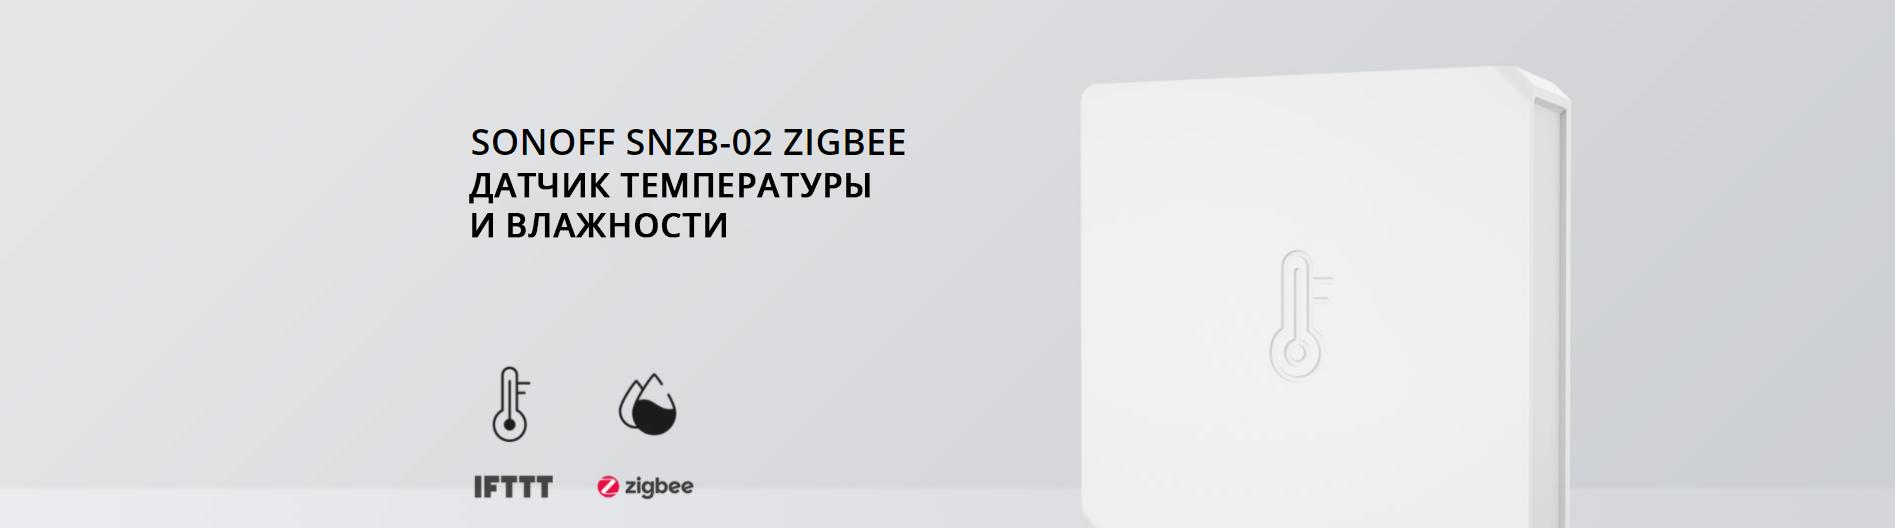 sonoff-snzb-02